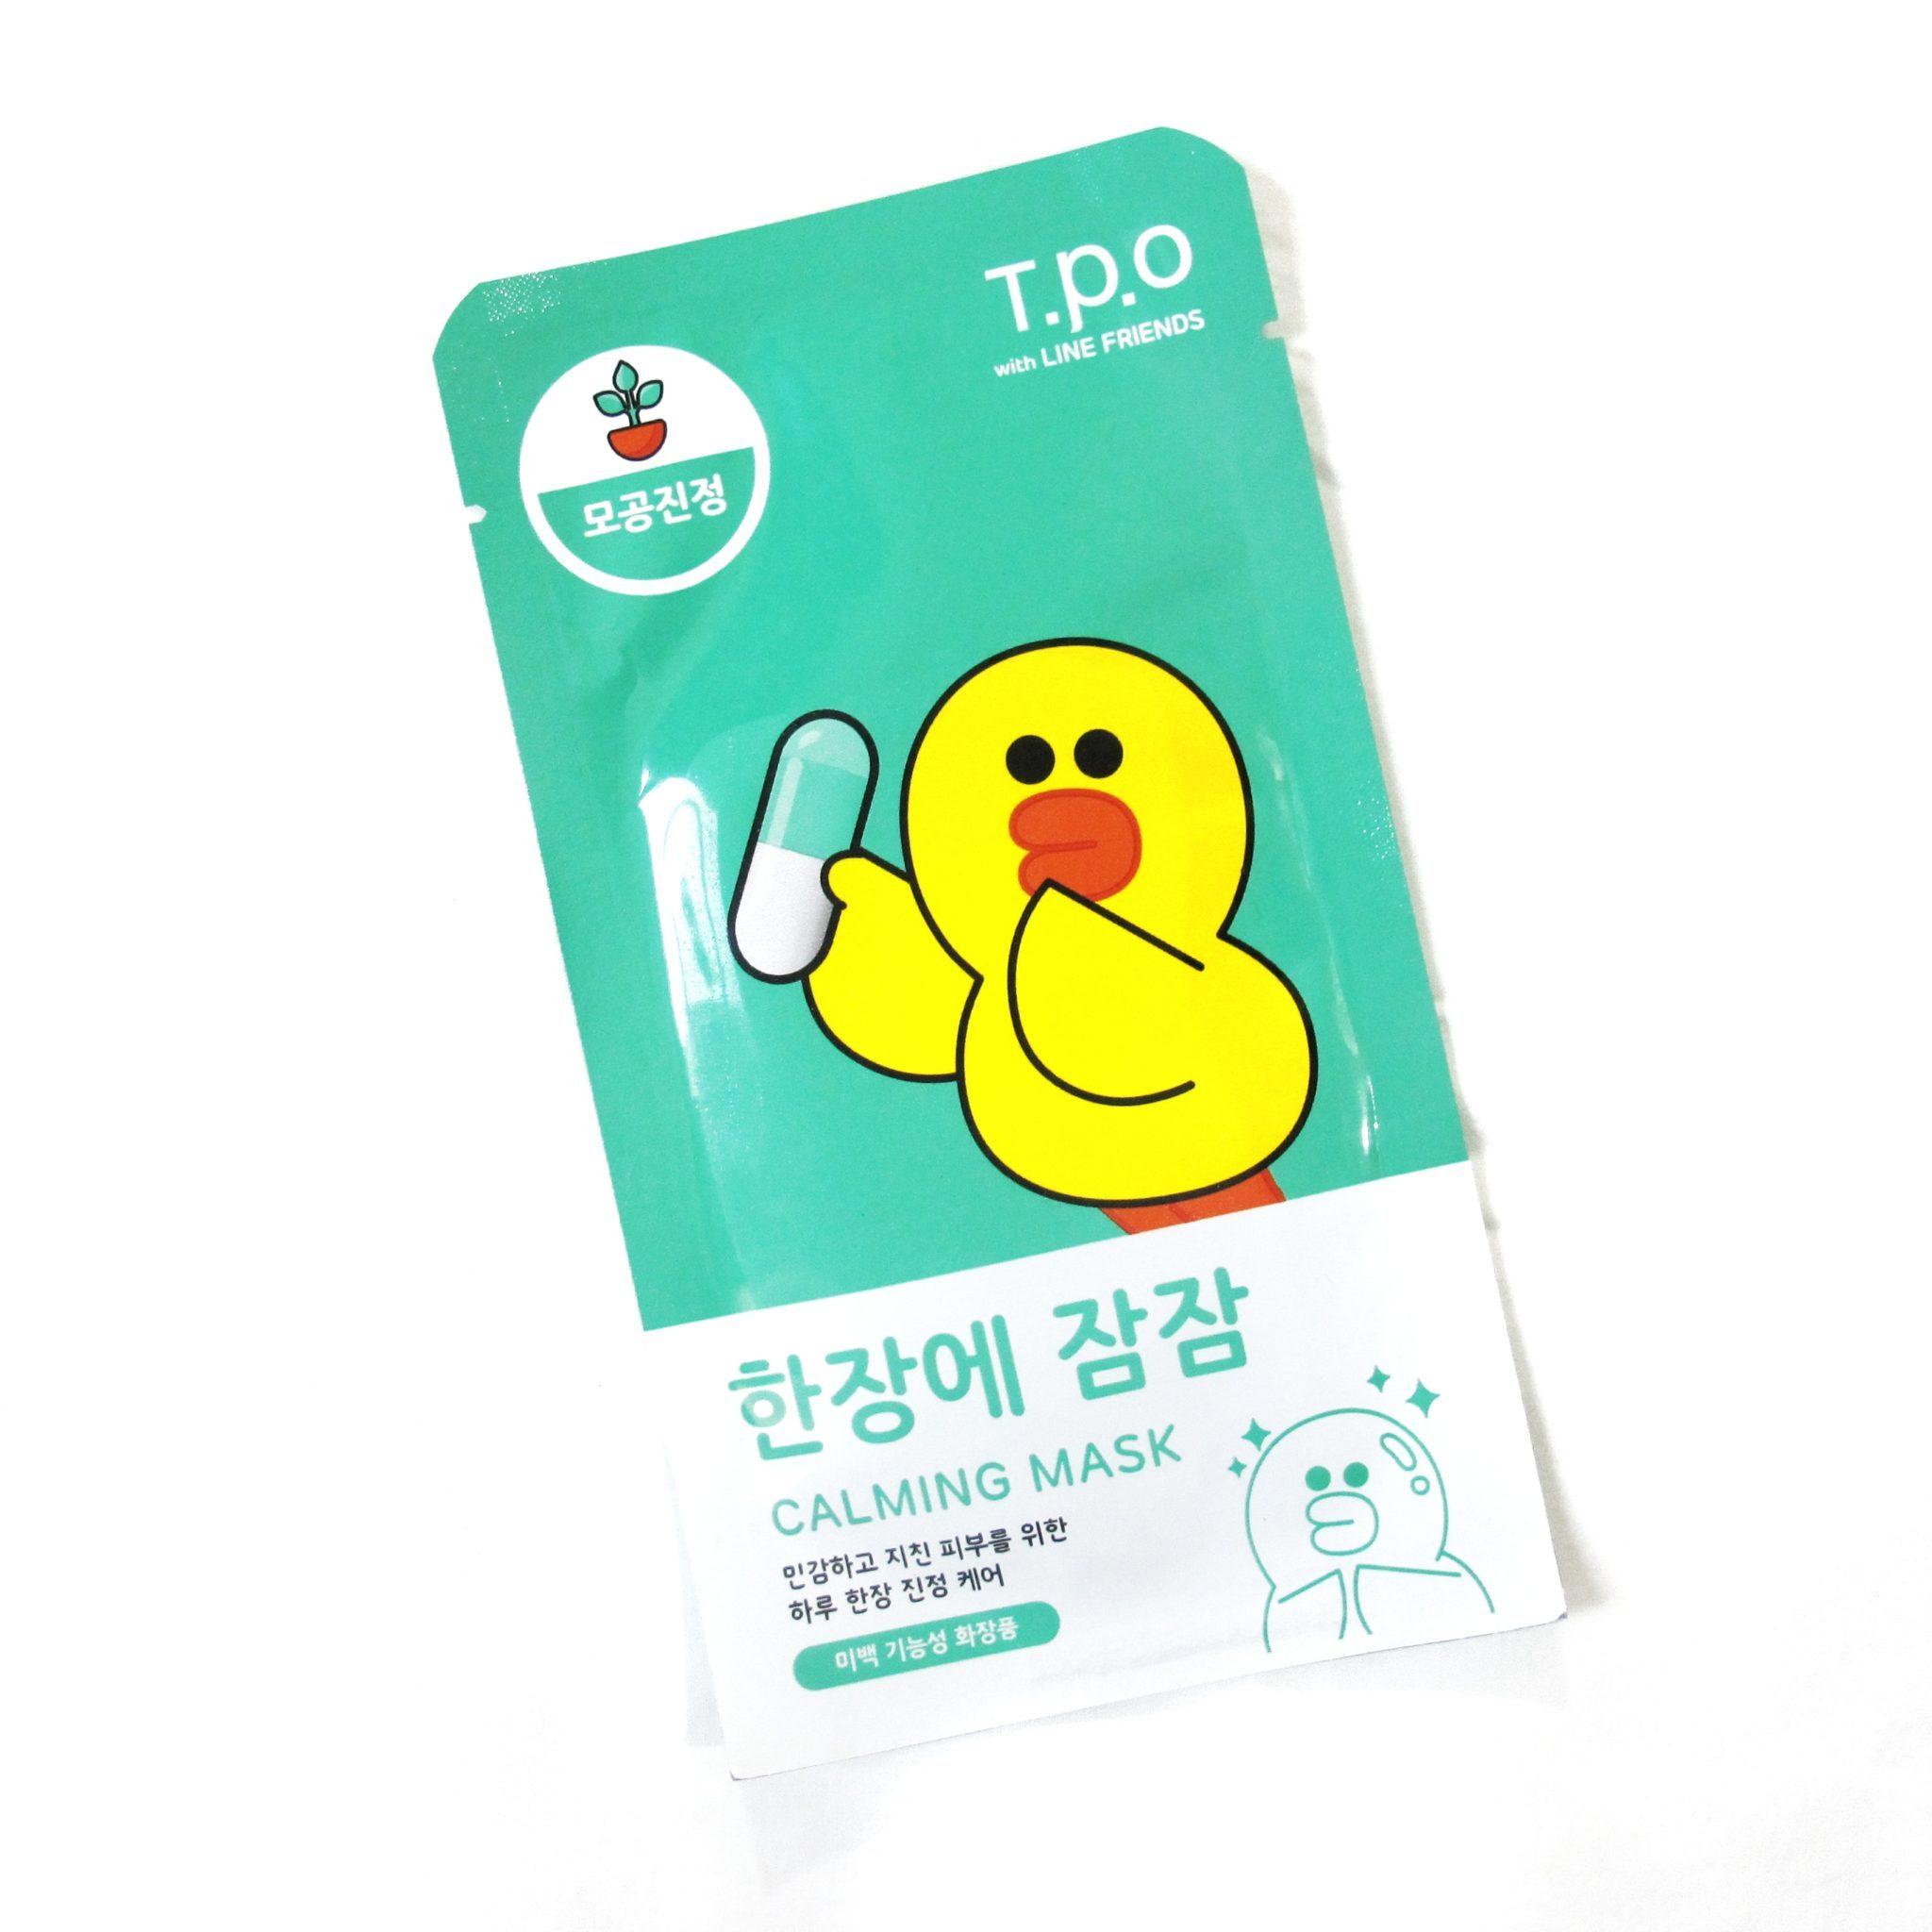 T.P.O LINE Friends Face Mask